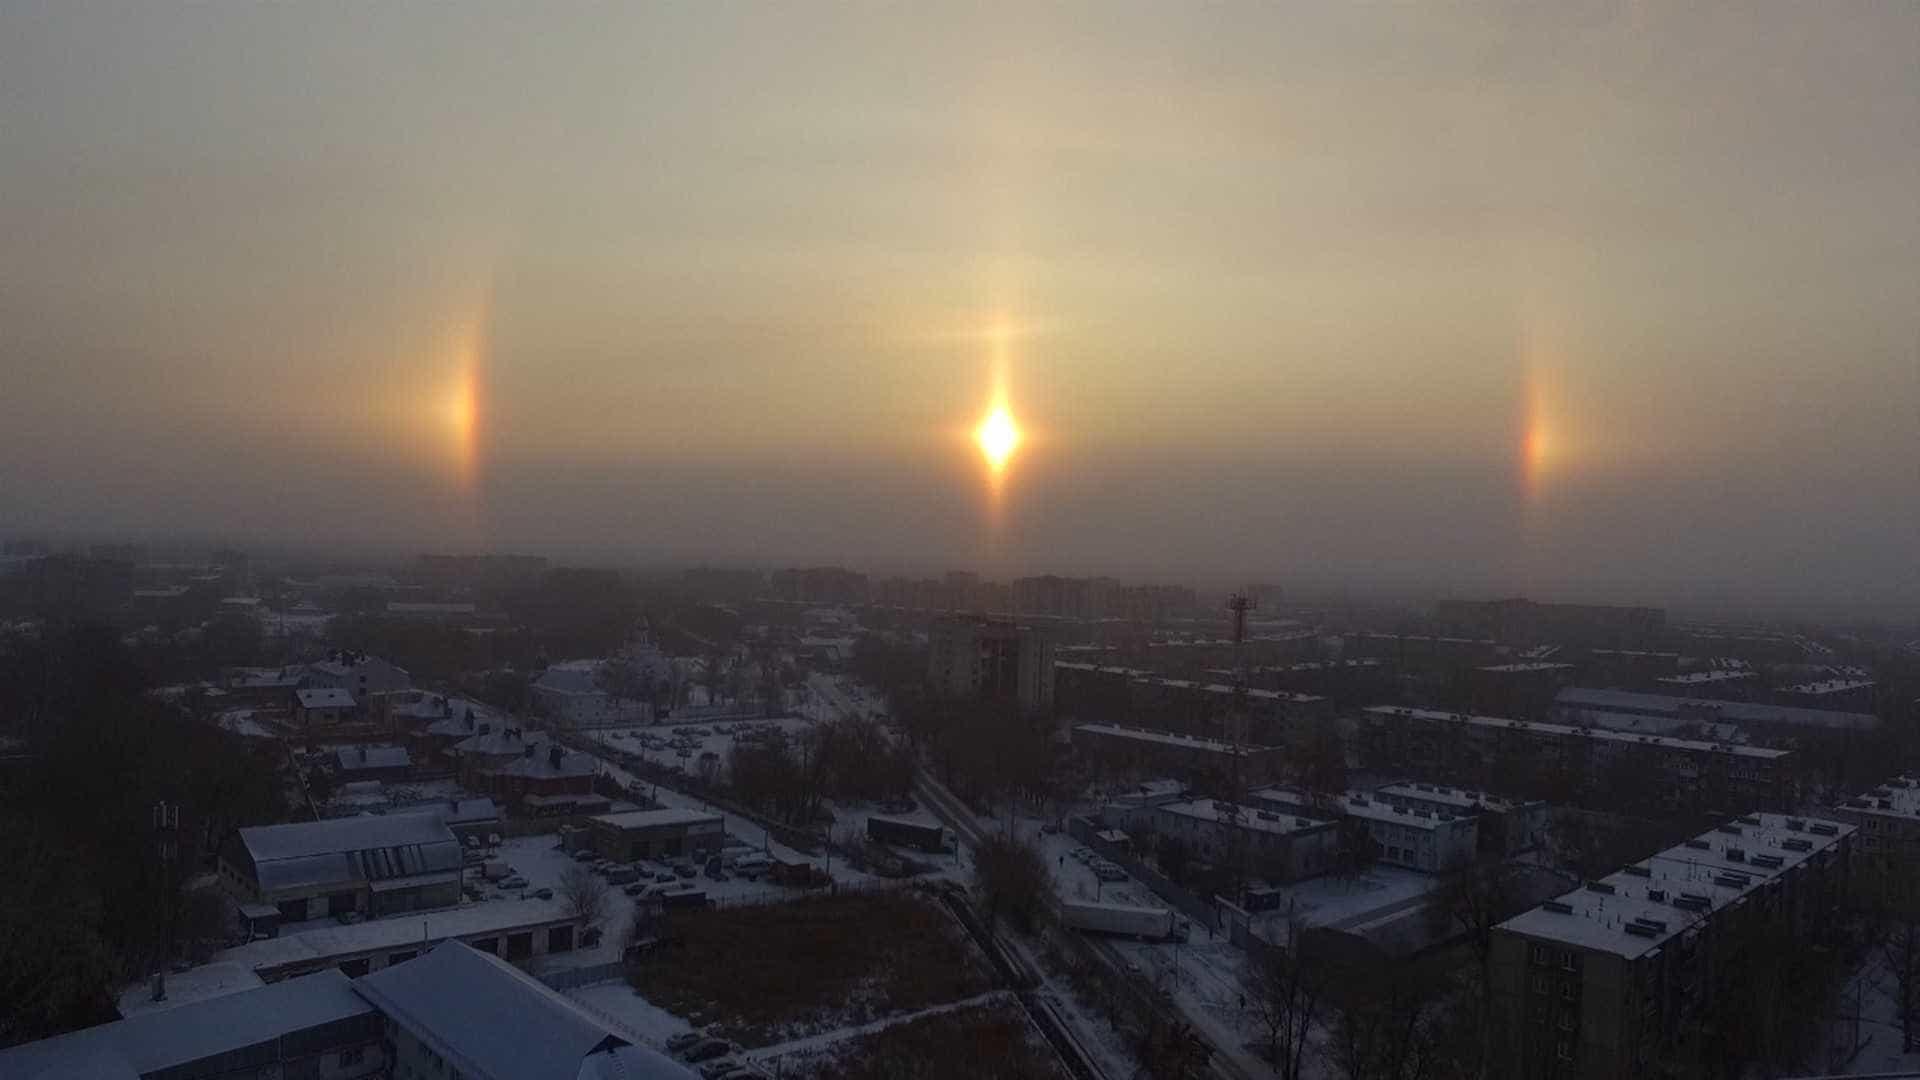 Fenômeno natural cria auréola em volta do Sol na Rússia